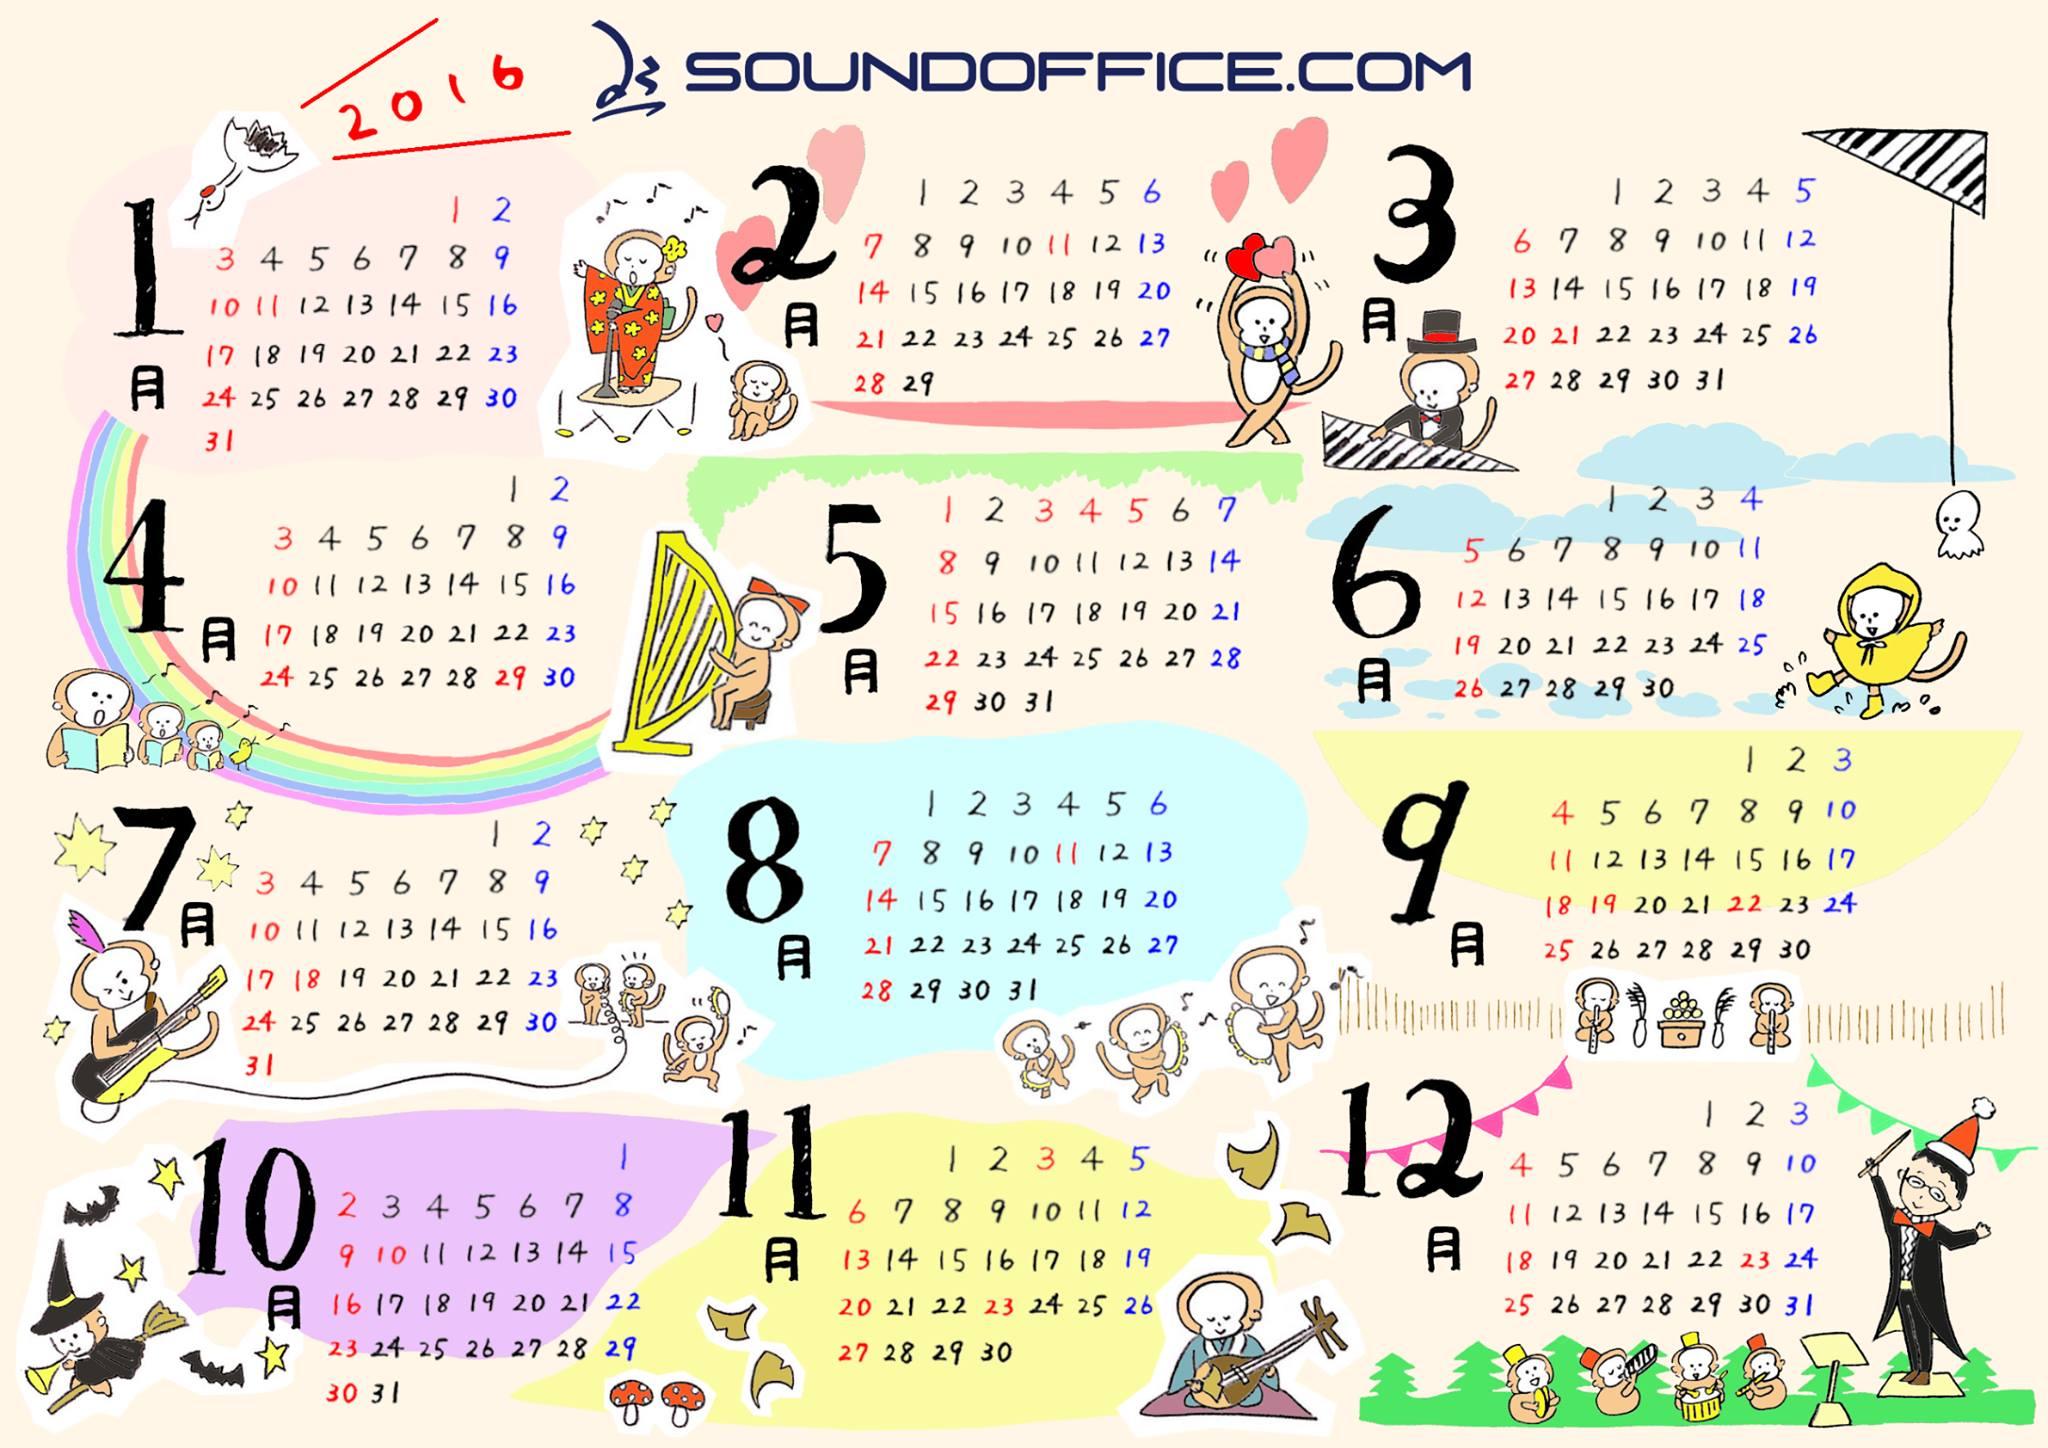 2015 Calendar Template Excel